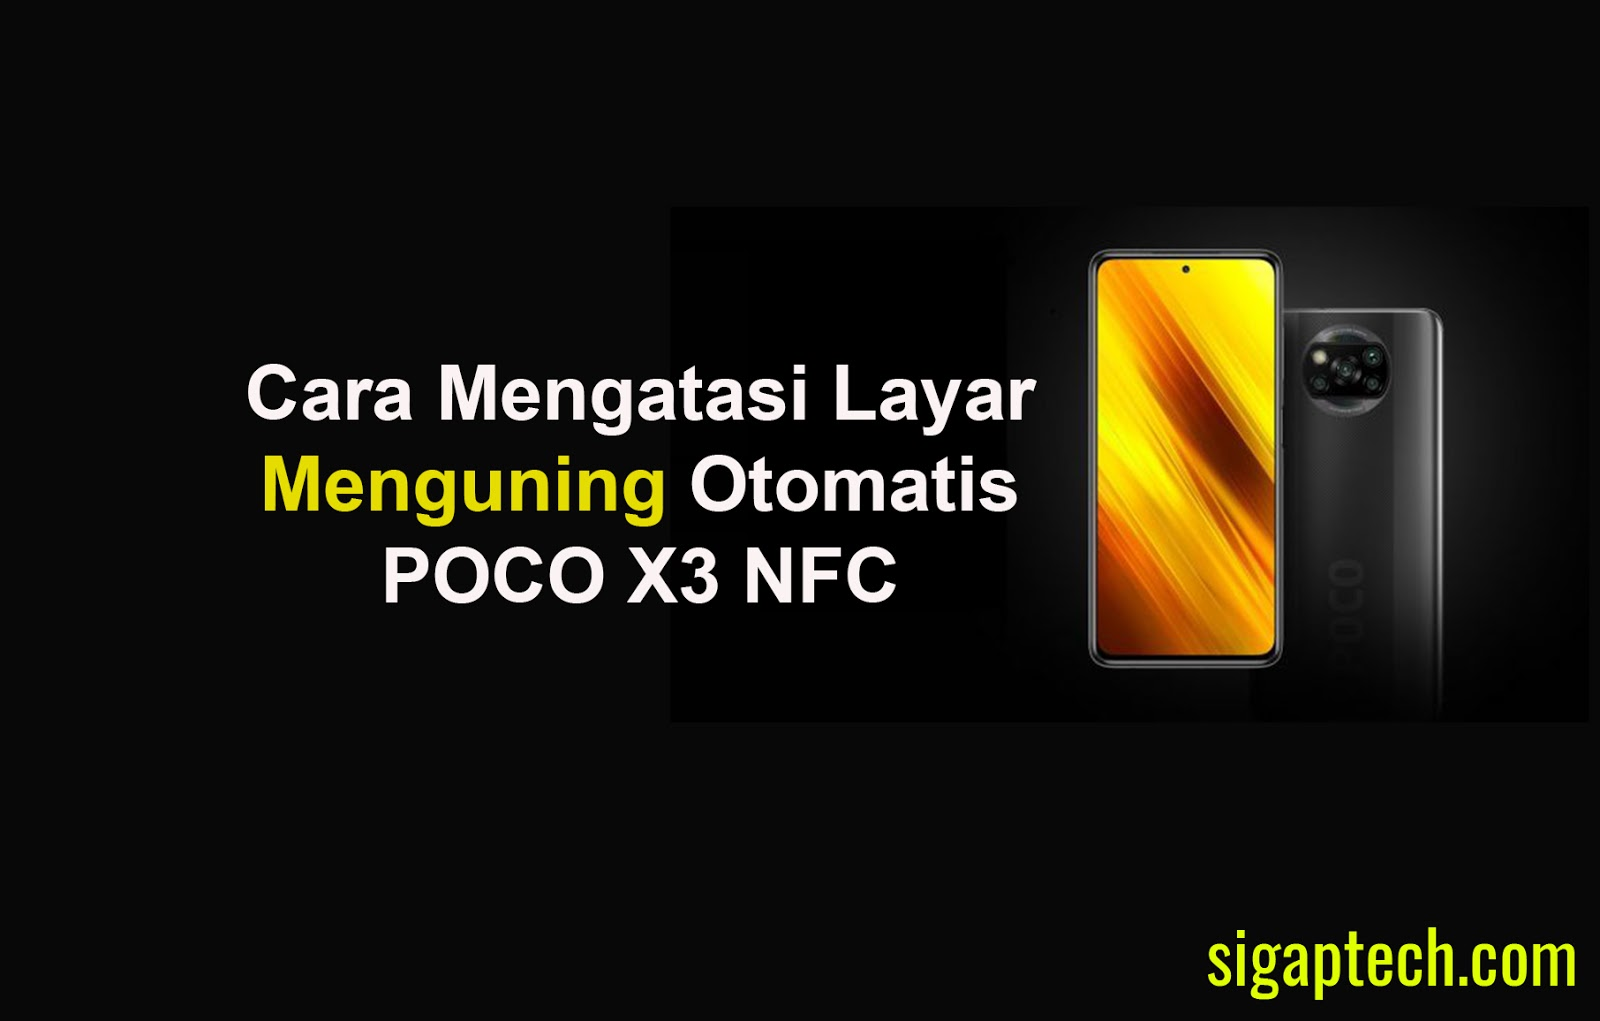 Cara Mengatasi Layar Menguning Otomatis POCO X3 NFC